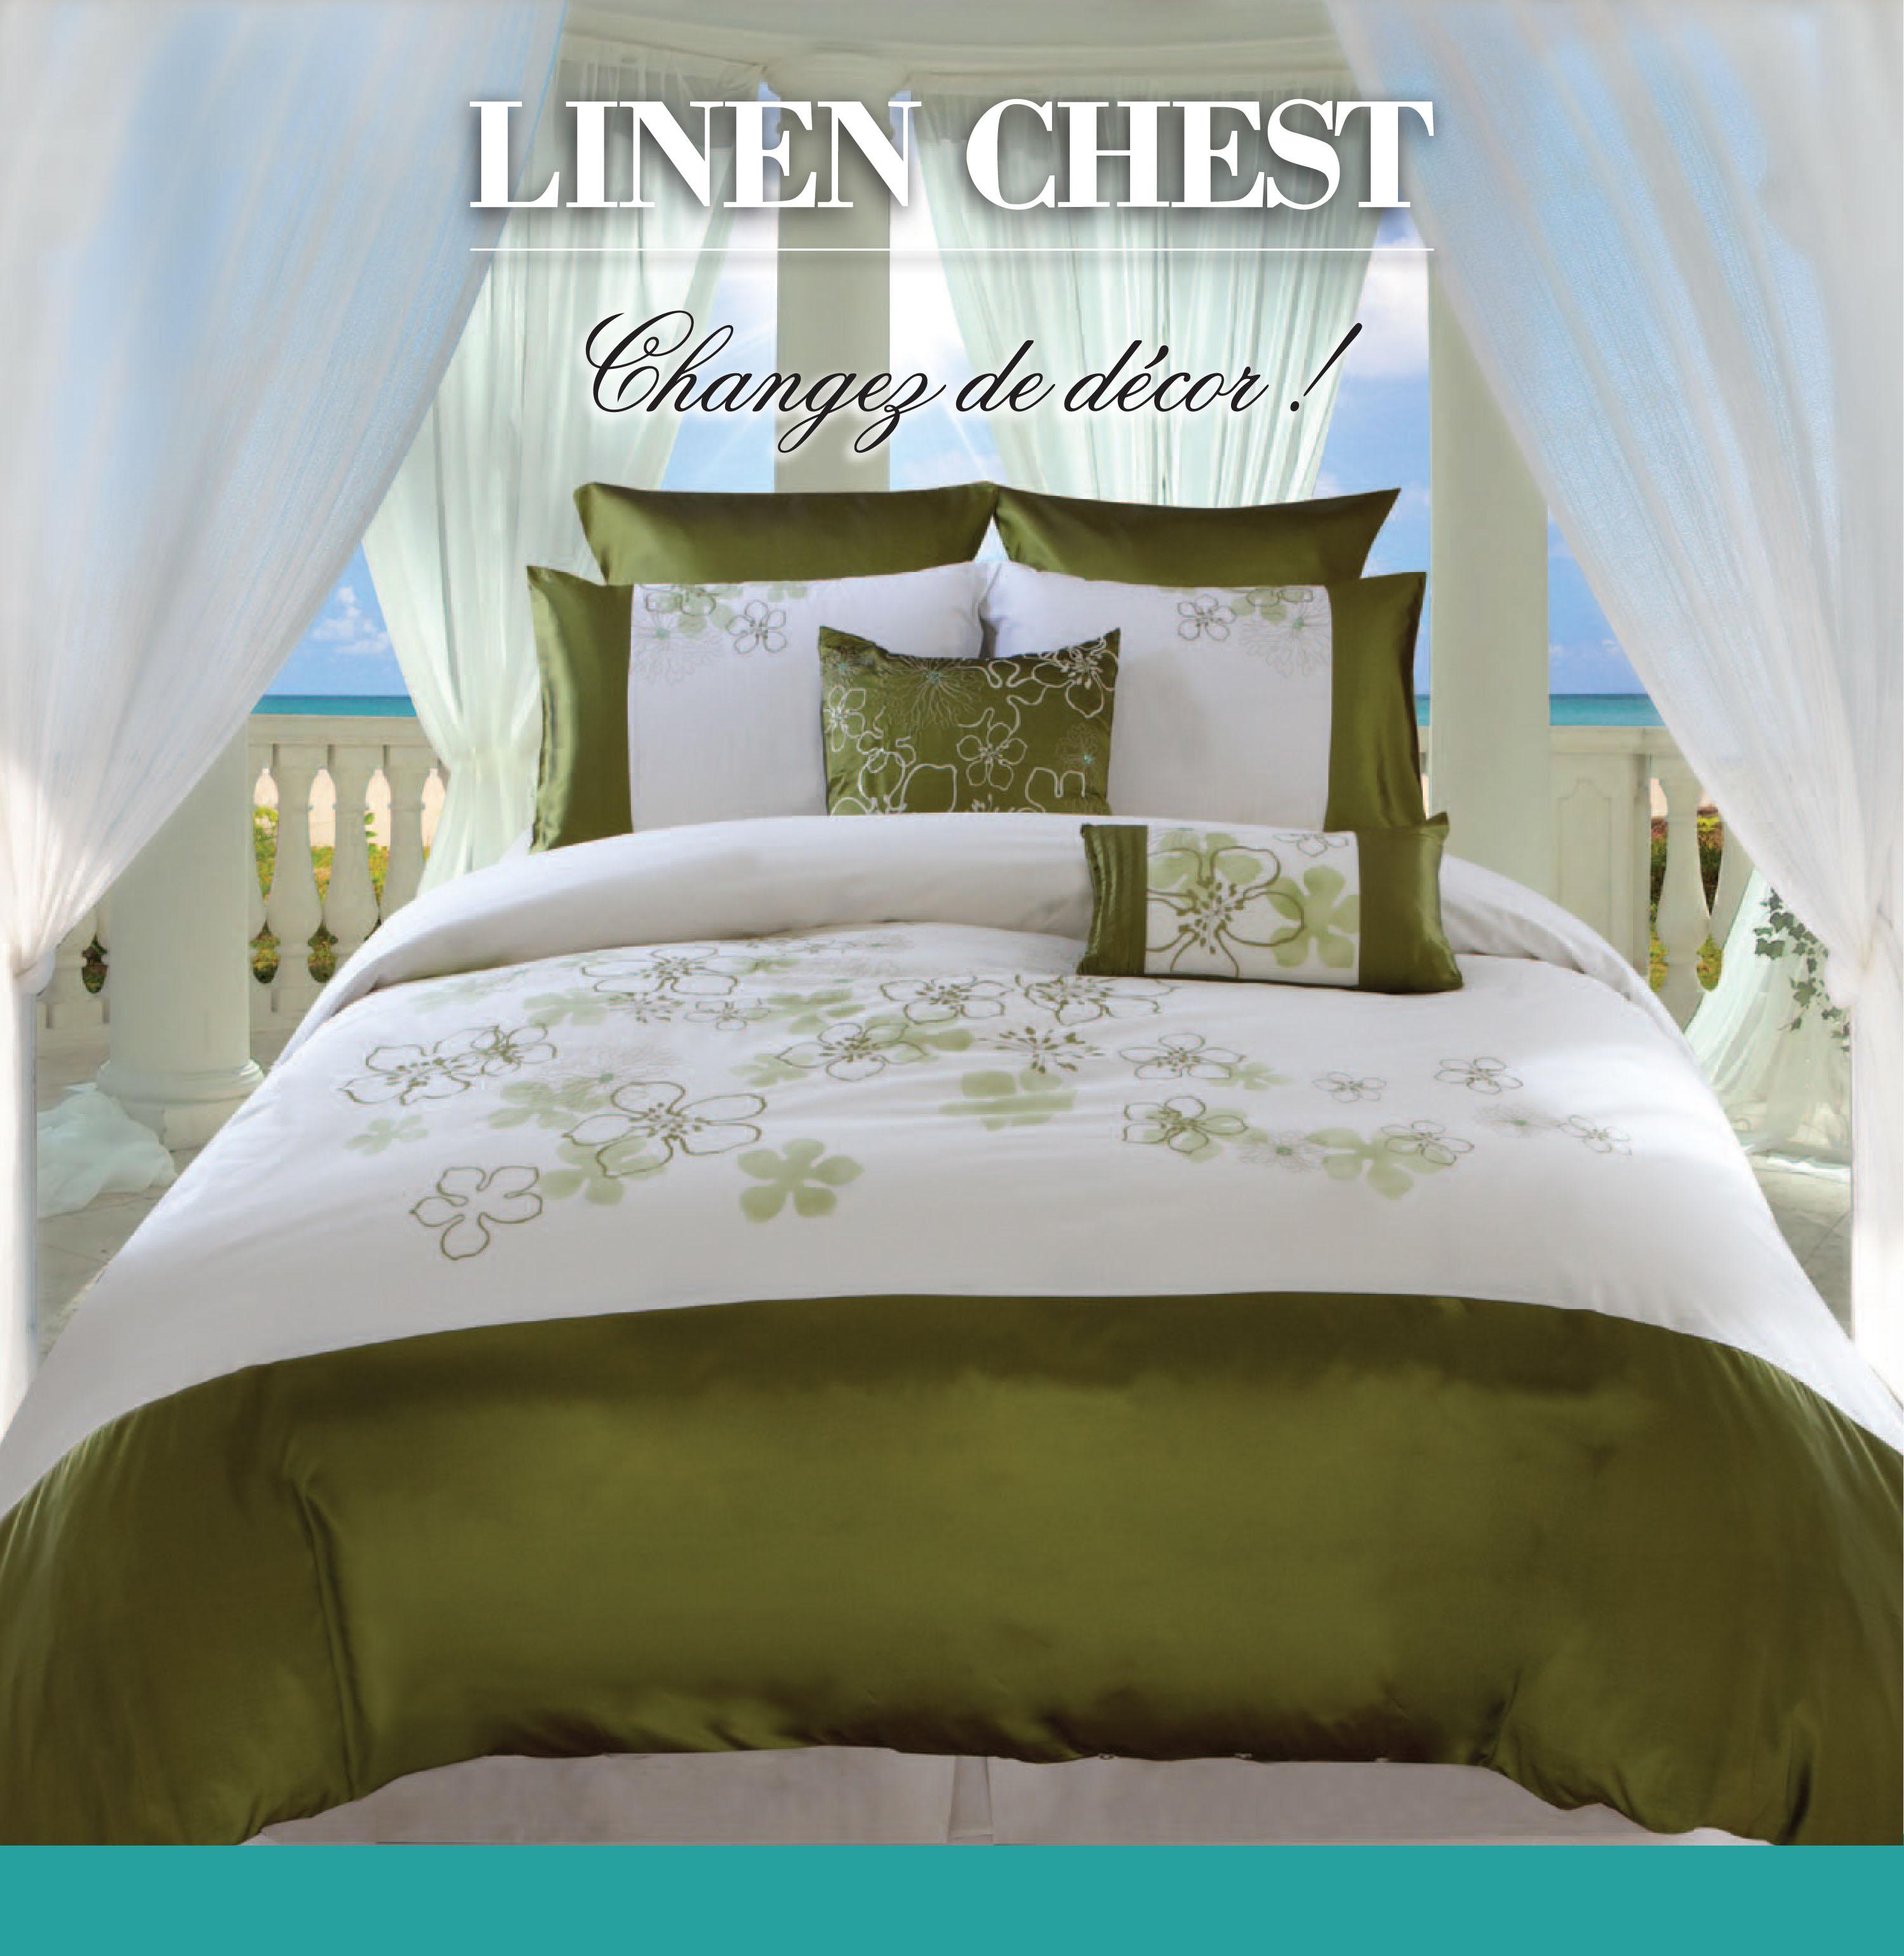 Linen Chest Flyer ∙ Brochure